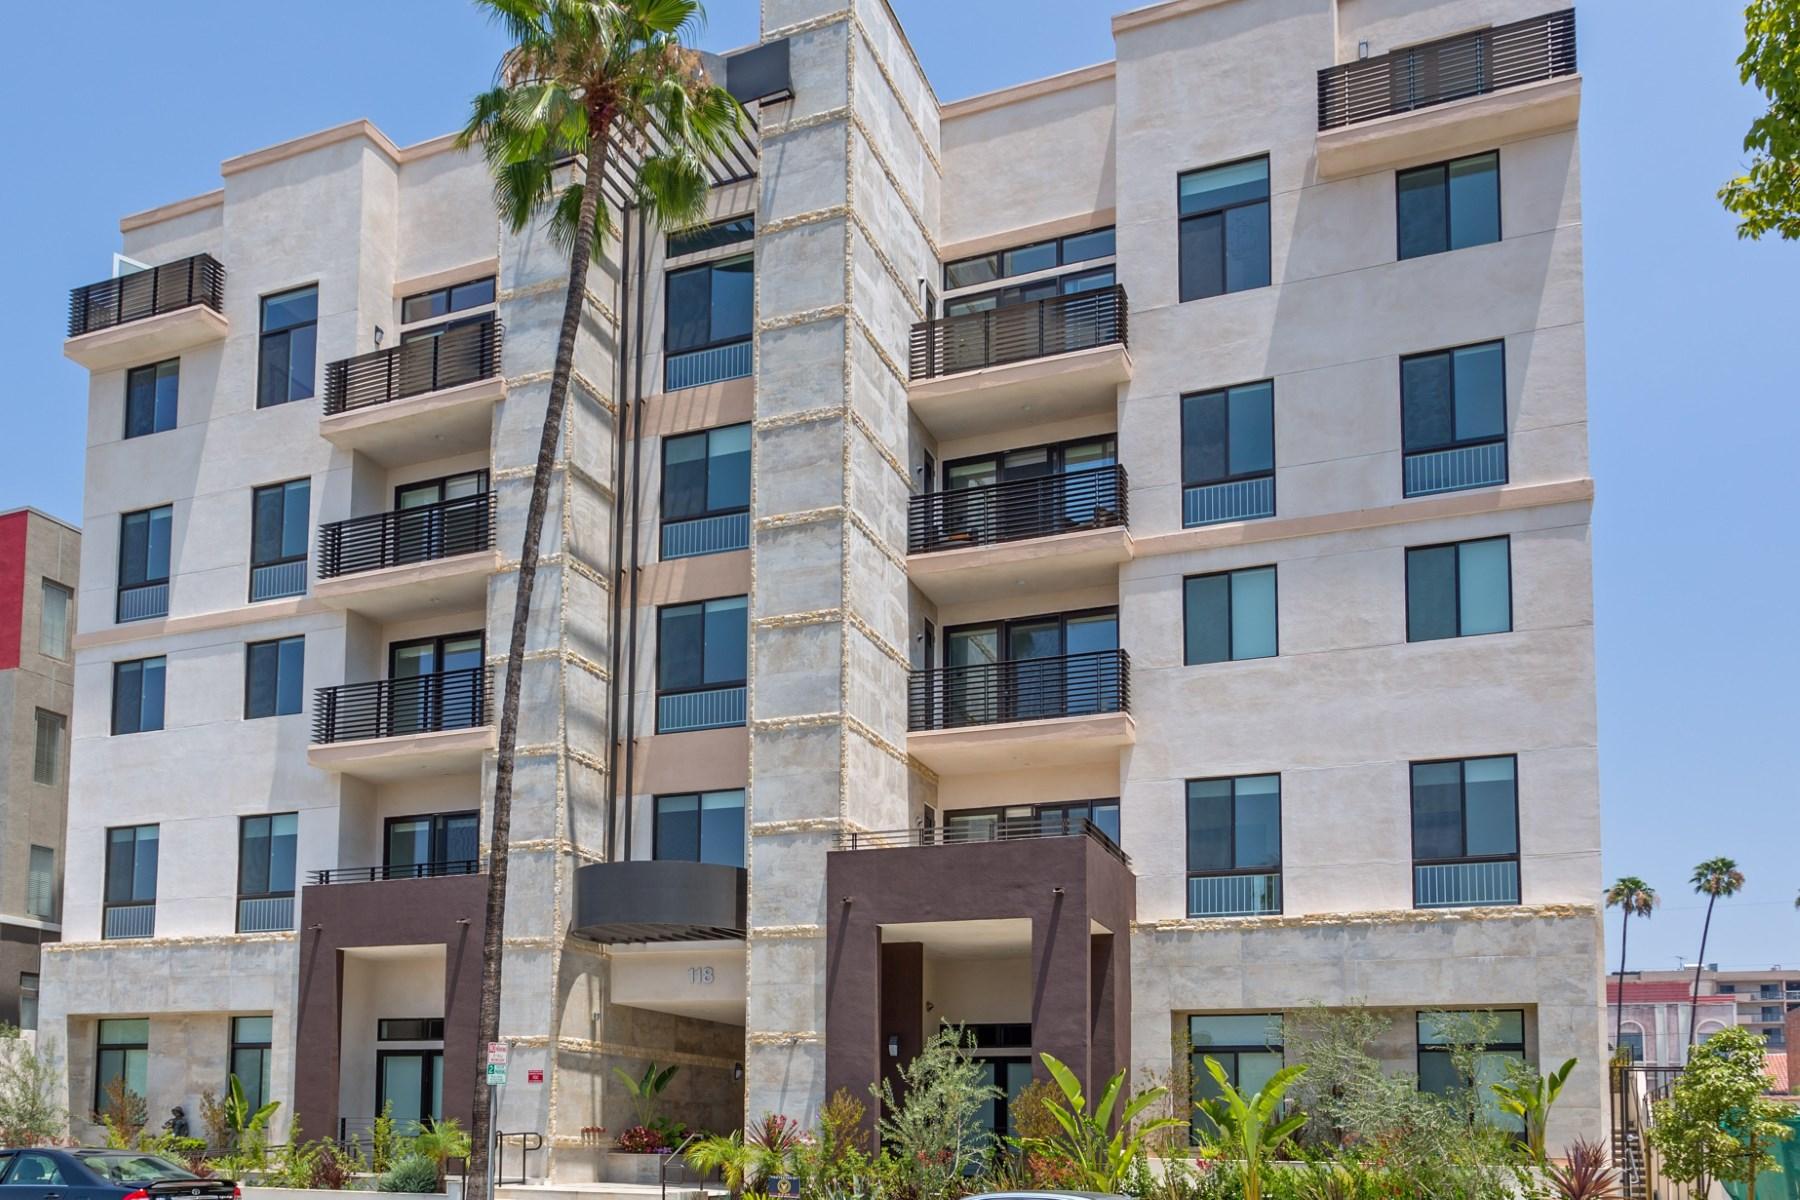 Condominio per Vendita alle ore 118 S Kenwood Street #503 118 Kenwood Street Unit #503 Glendale, California, 91205 Stati Uniti